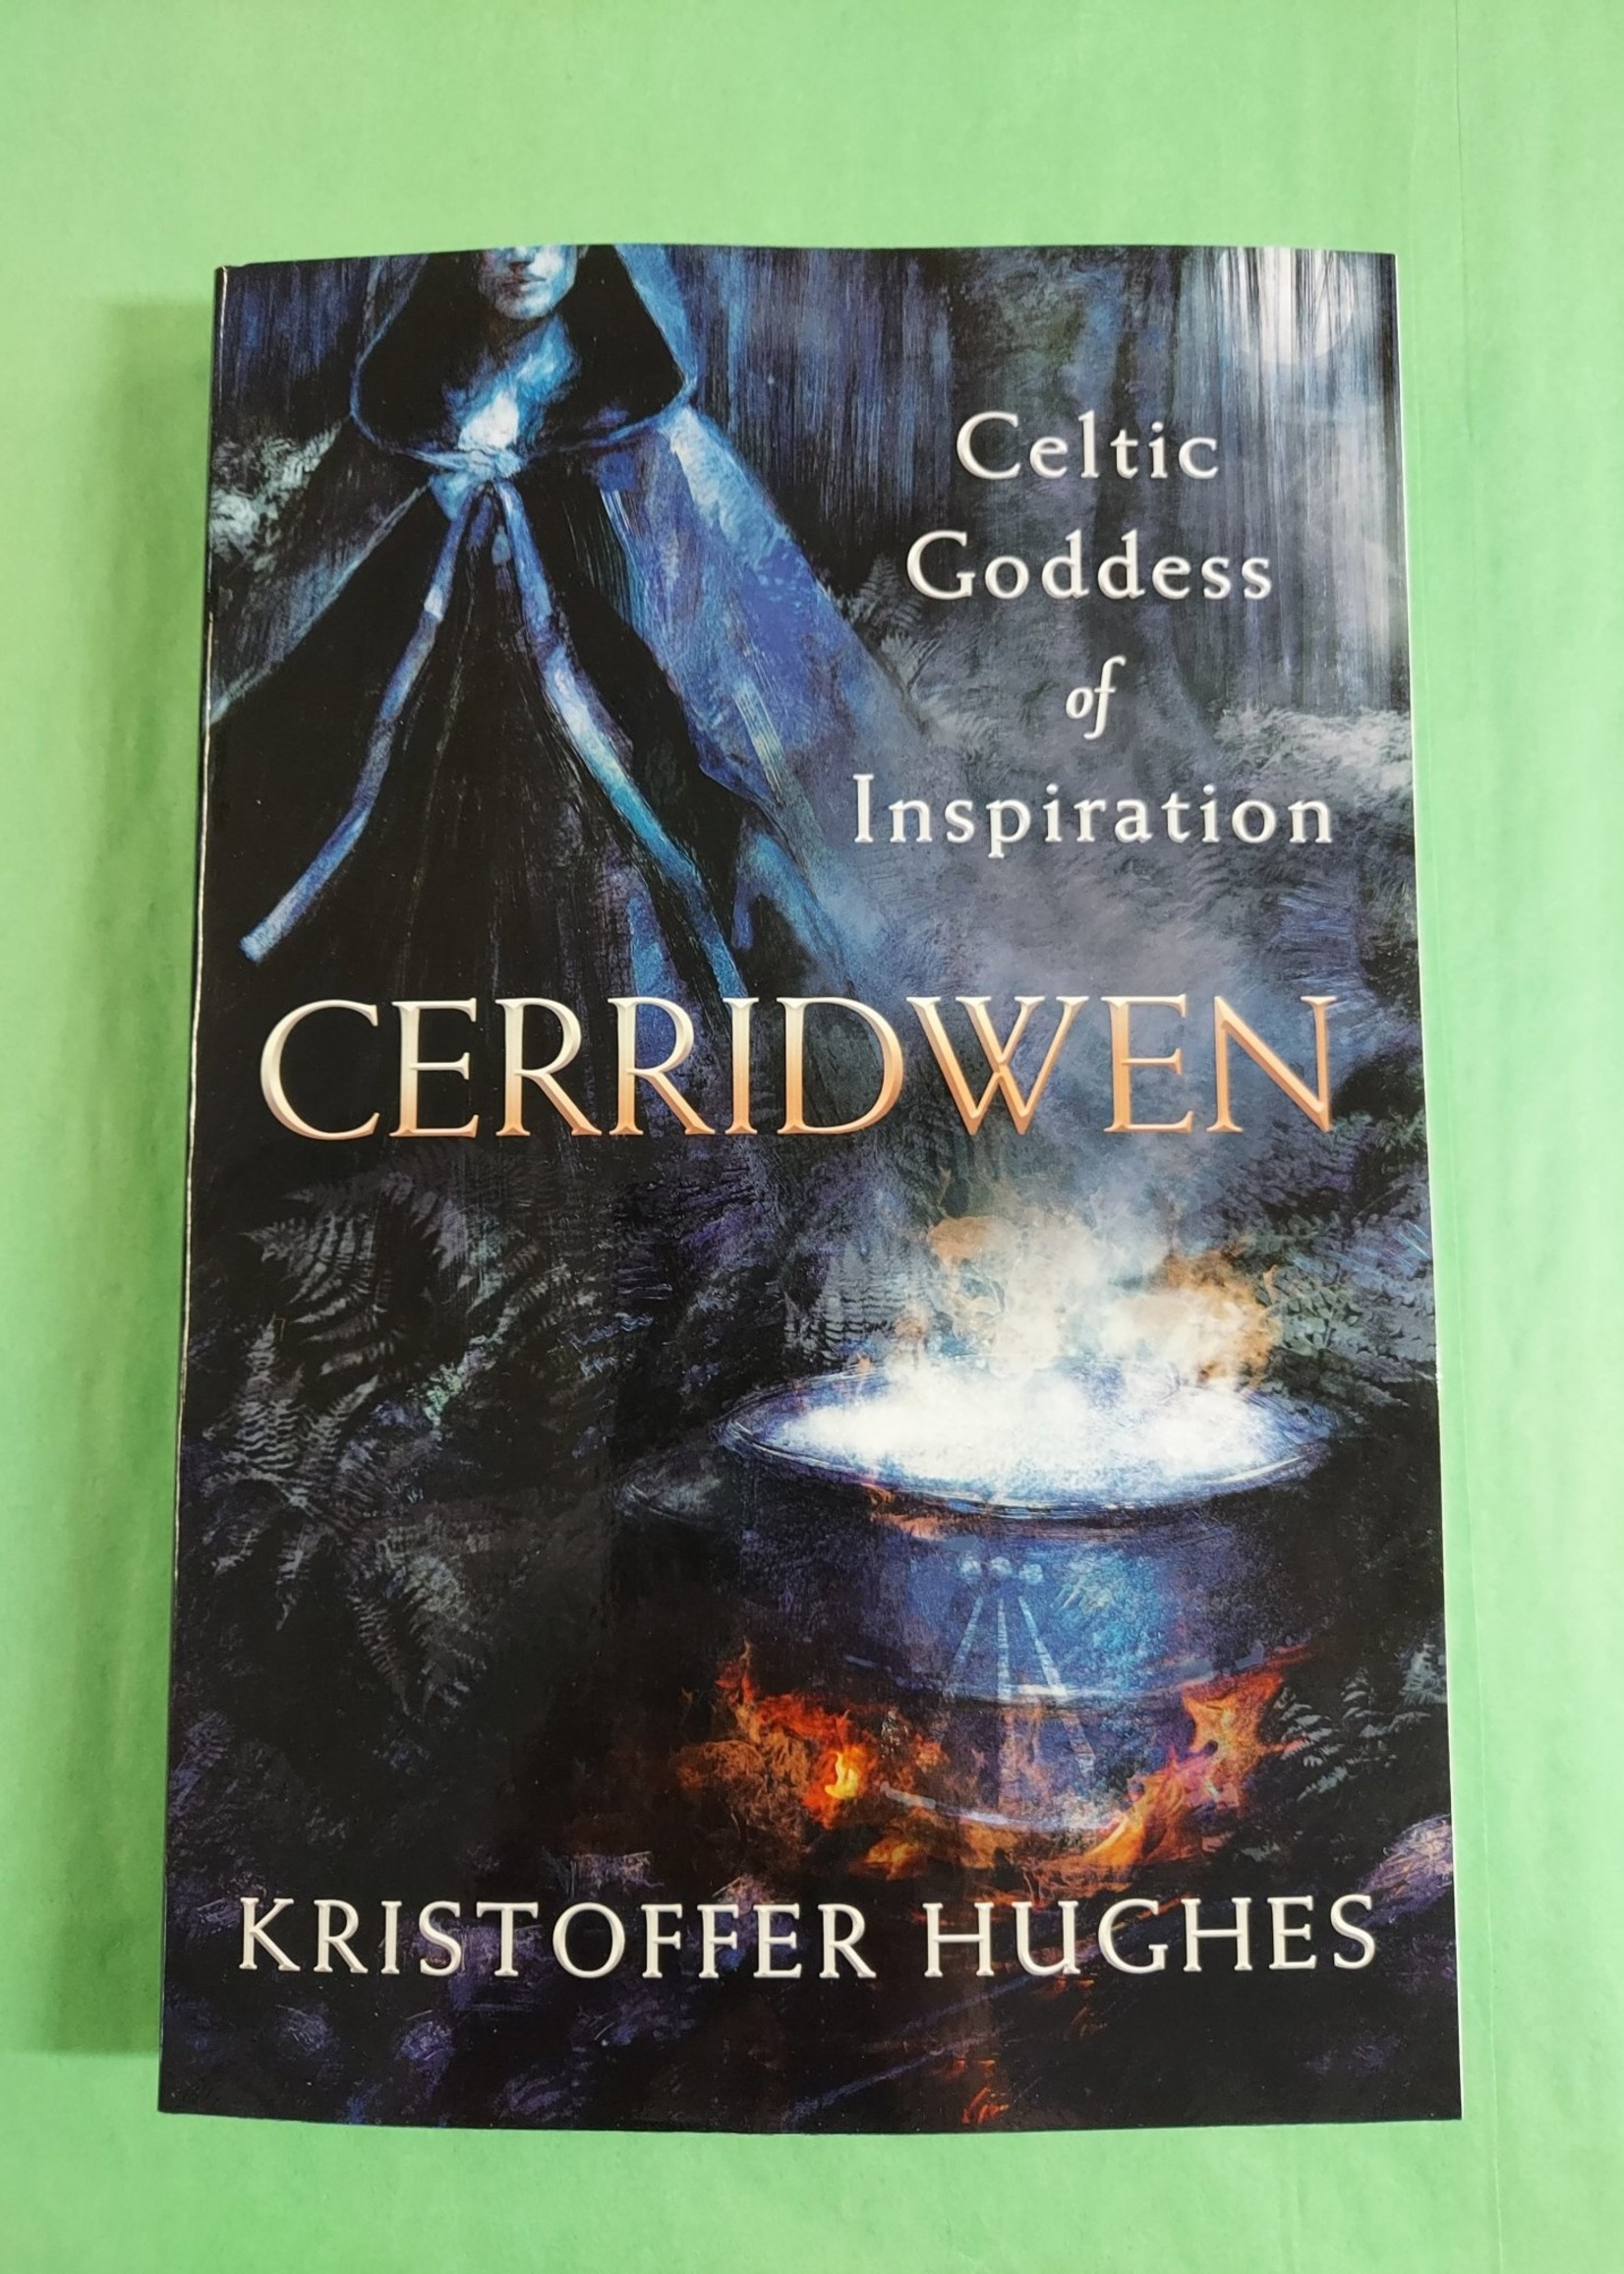 Cerridwen - BY KRISTOFFER HUGHES